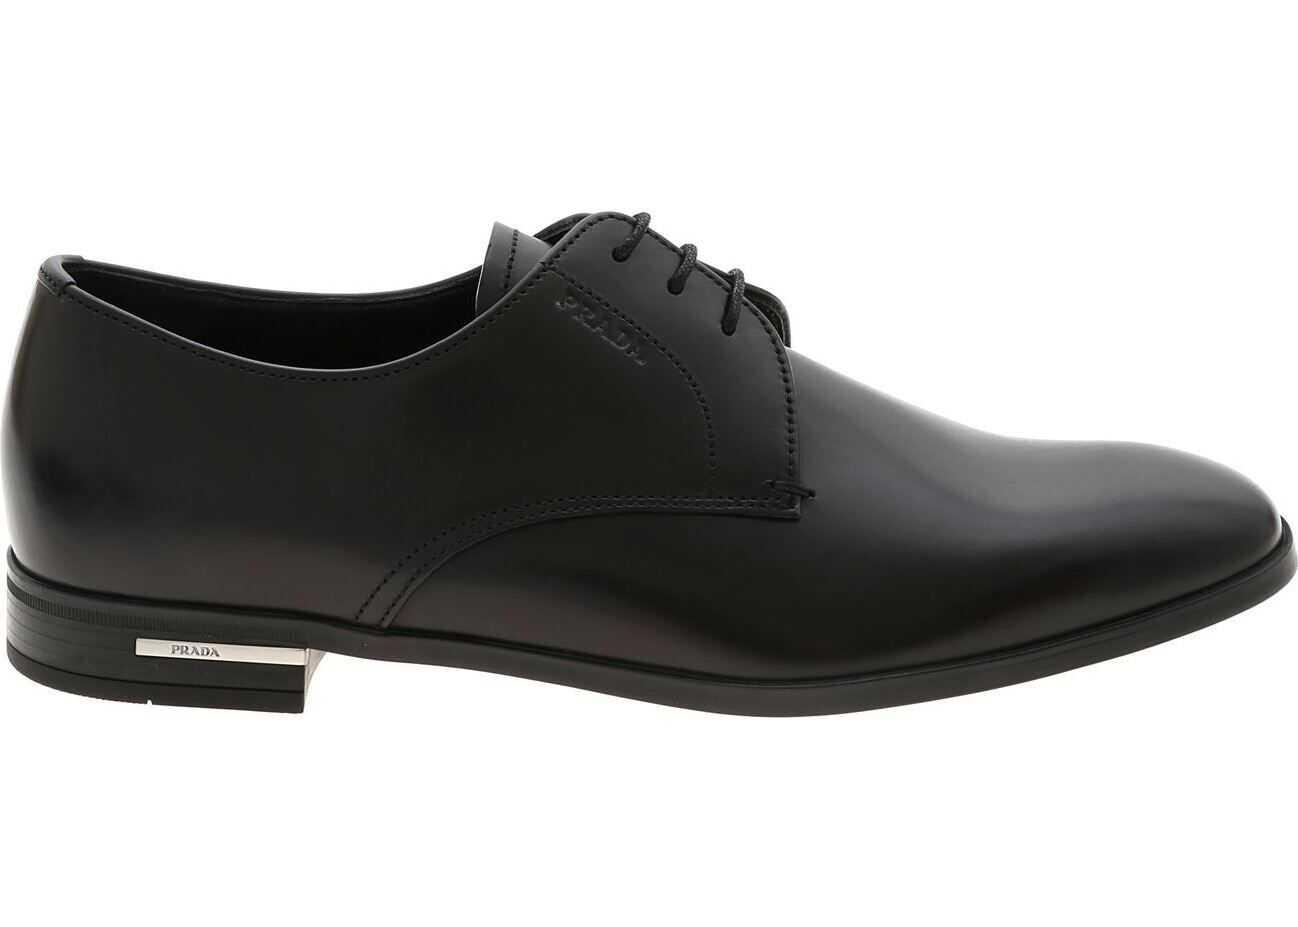 Prada Derby Shoes In Black With Logo Detail Black